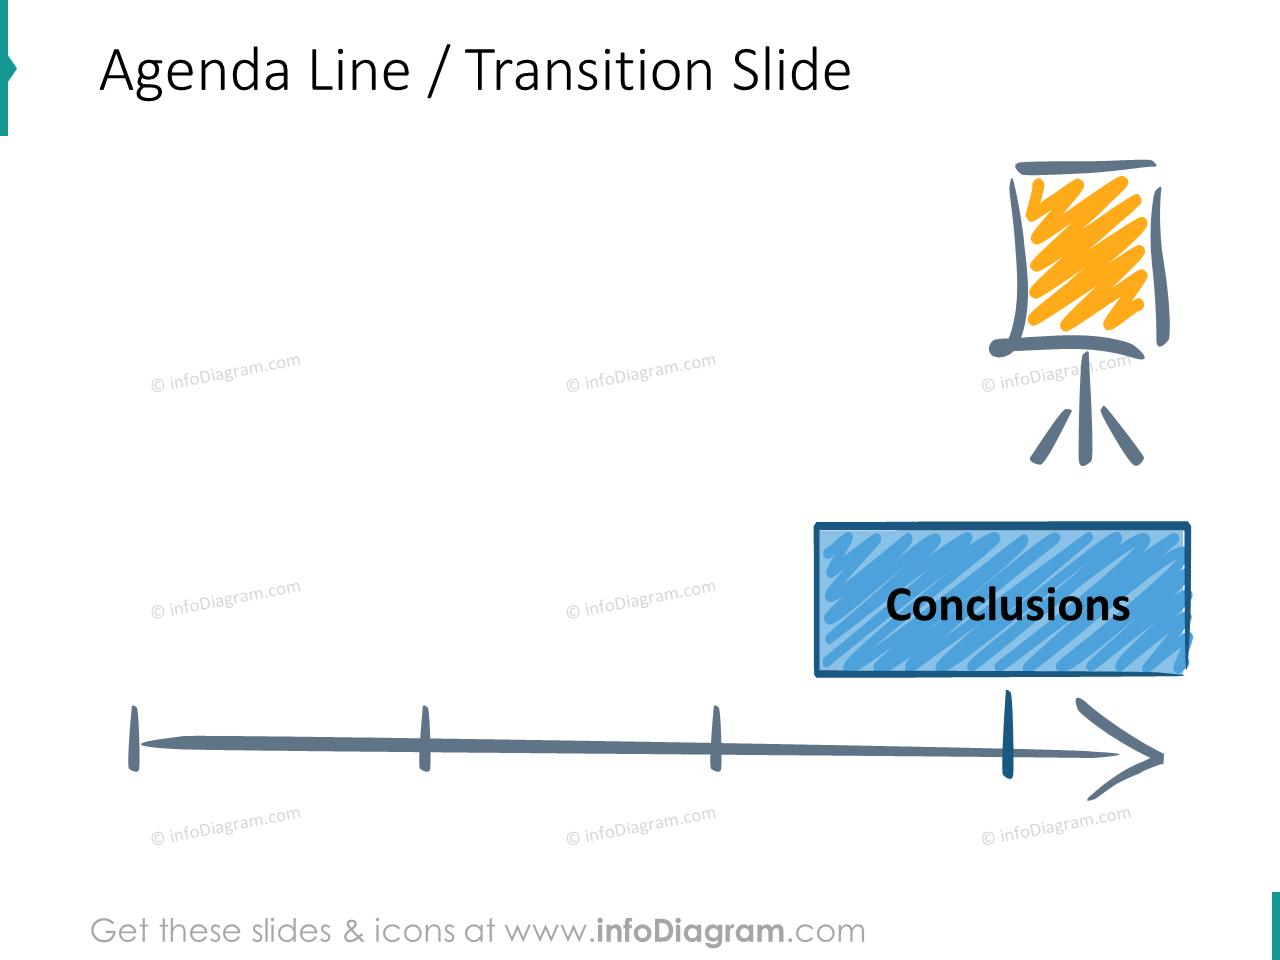 motivation training agenda transition slide conclusion icons ppt clipart